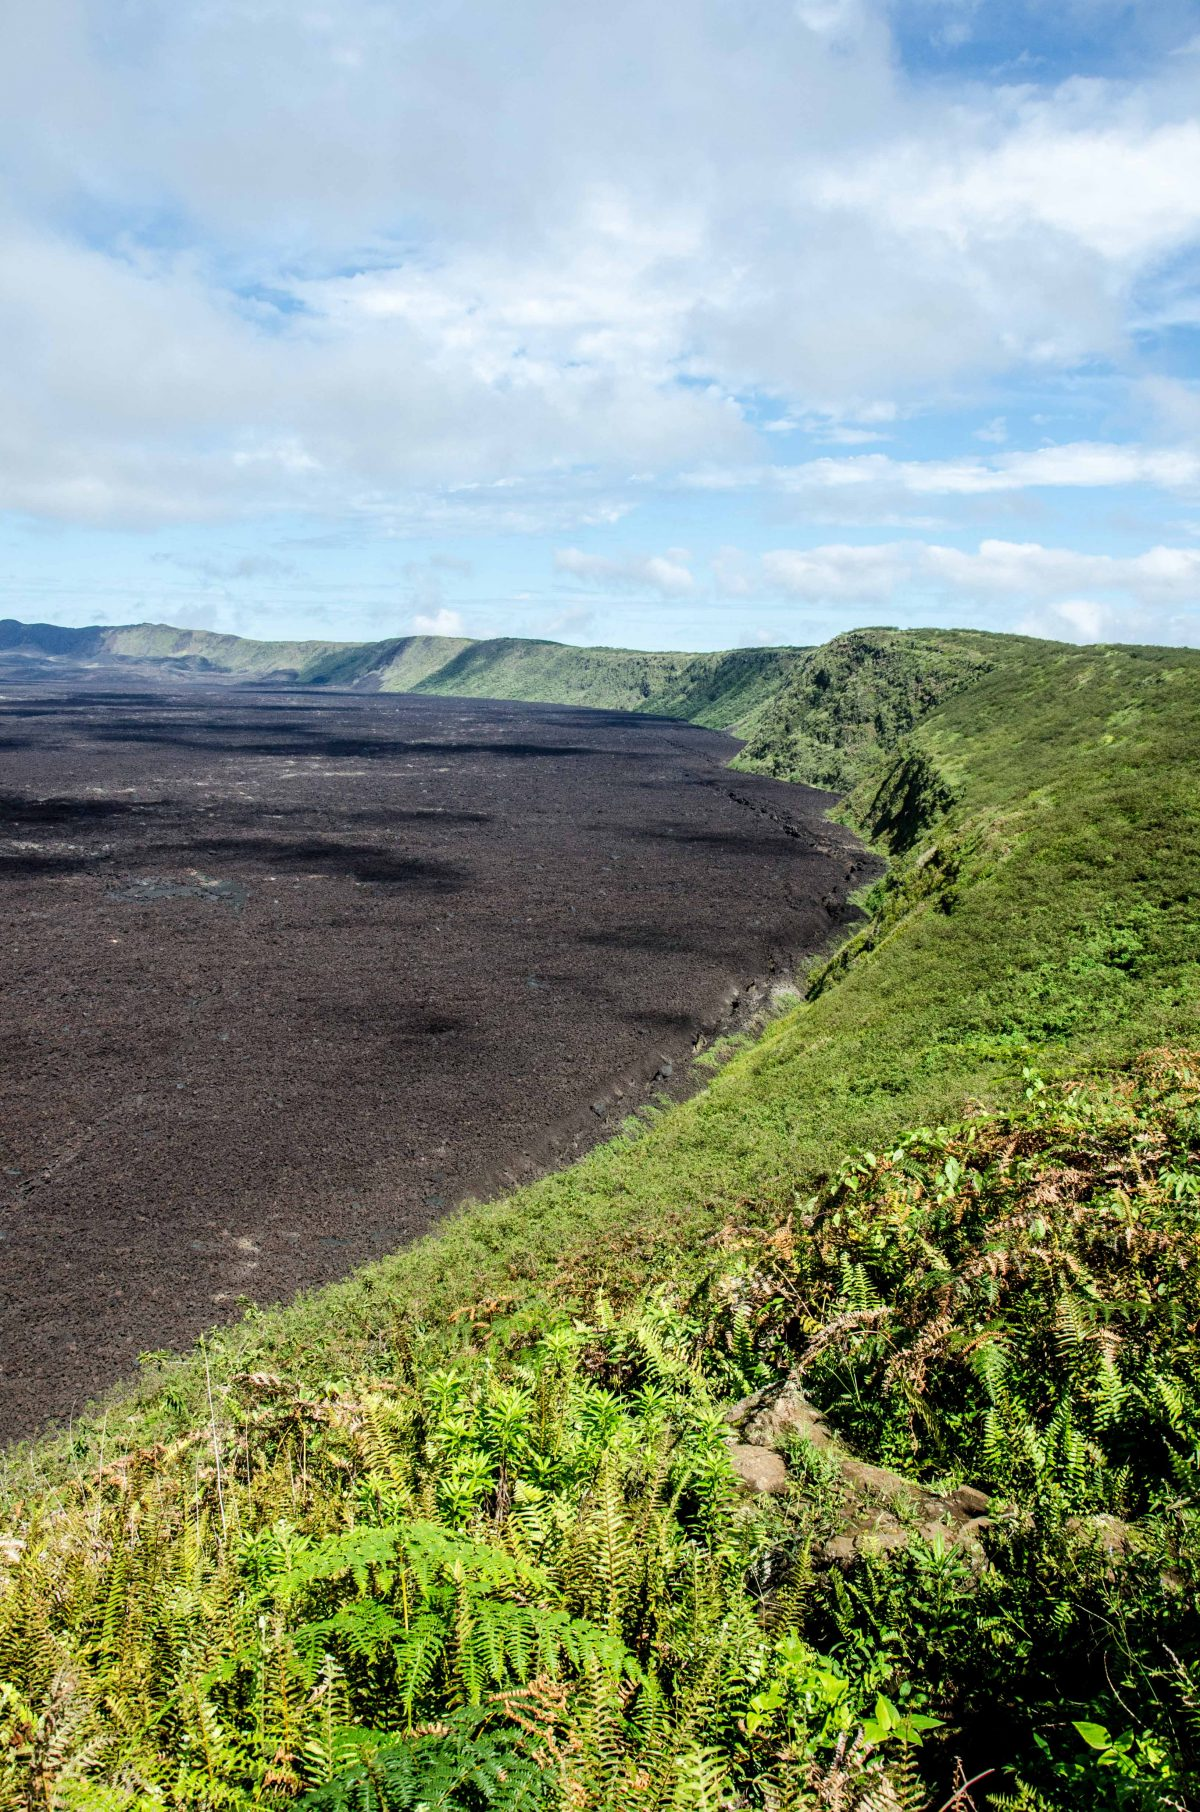 Volcan Sierra Negra, Isla Isabela, The Galapagos, Ecuador | ©Angela Drake / Not Your Average American